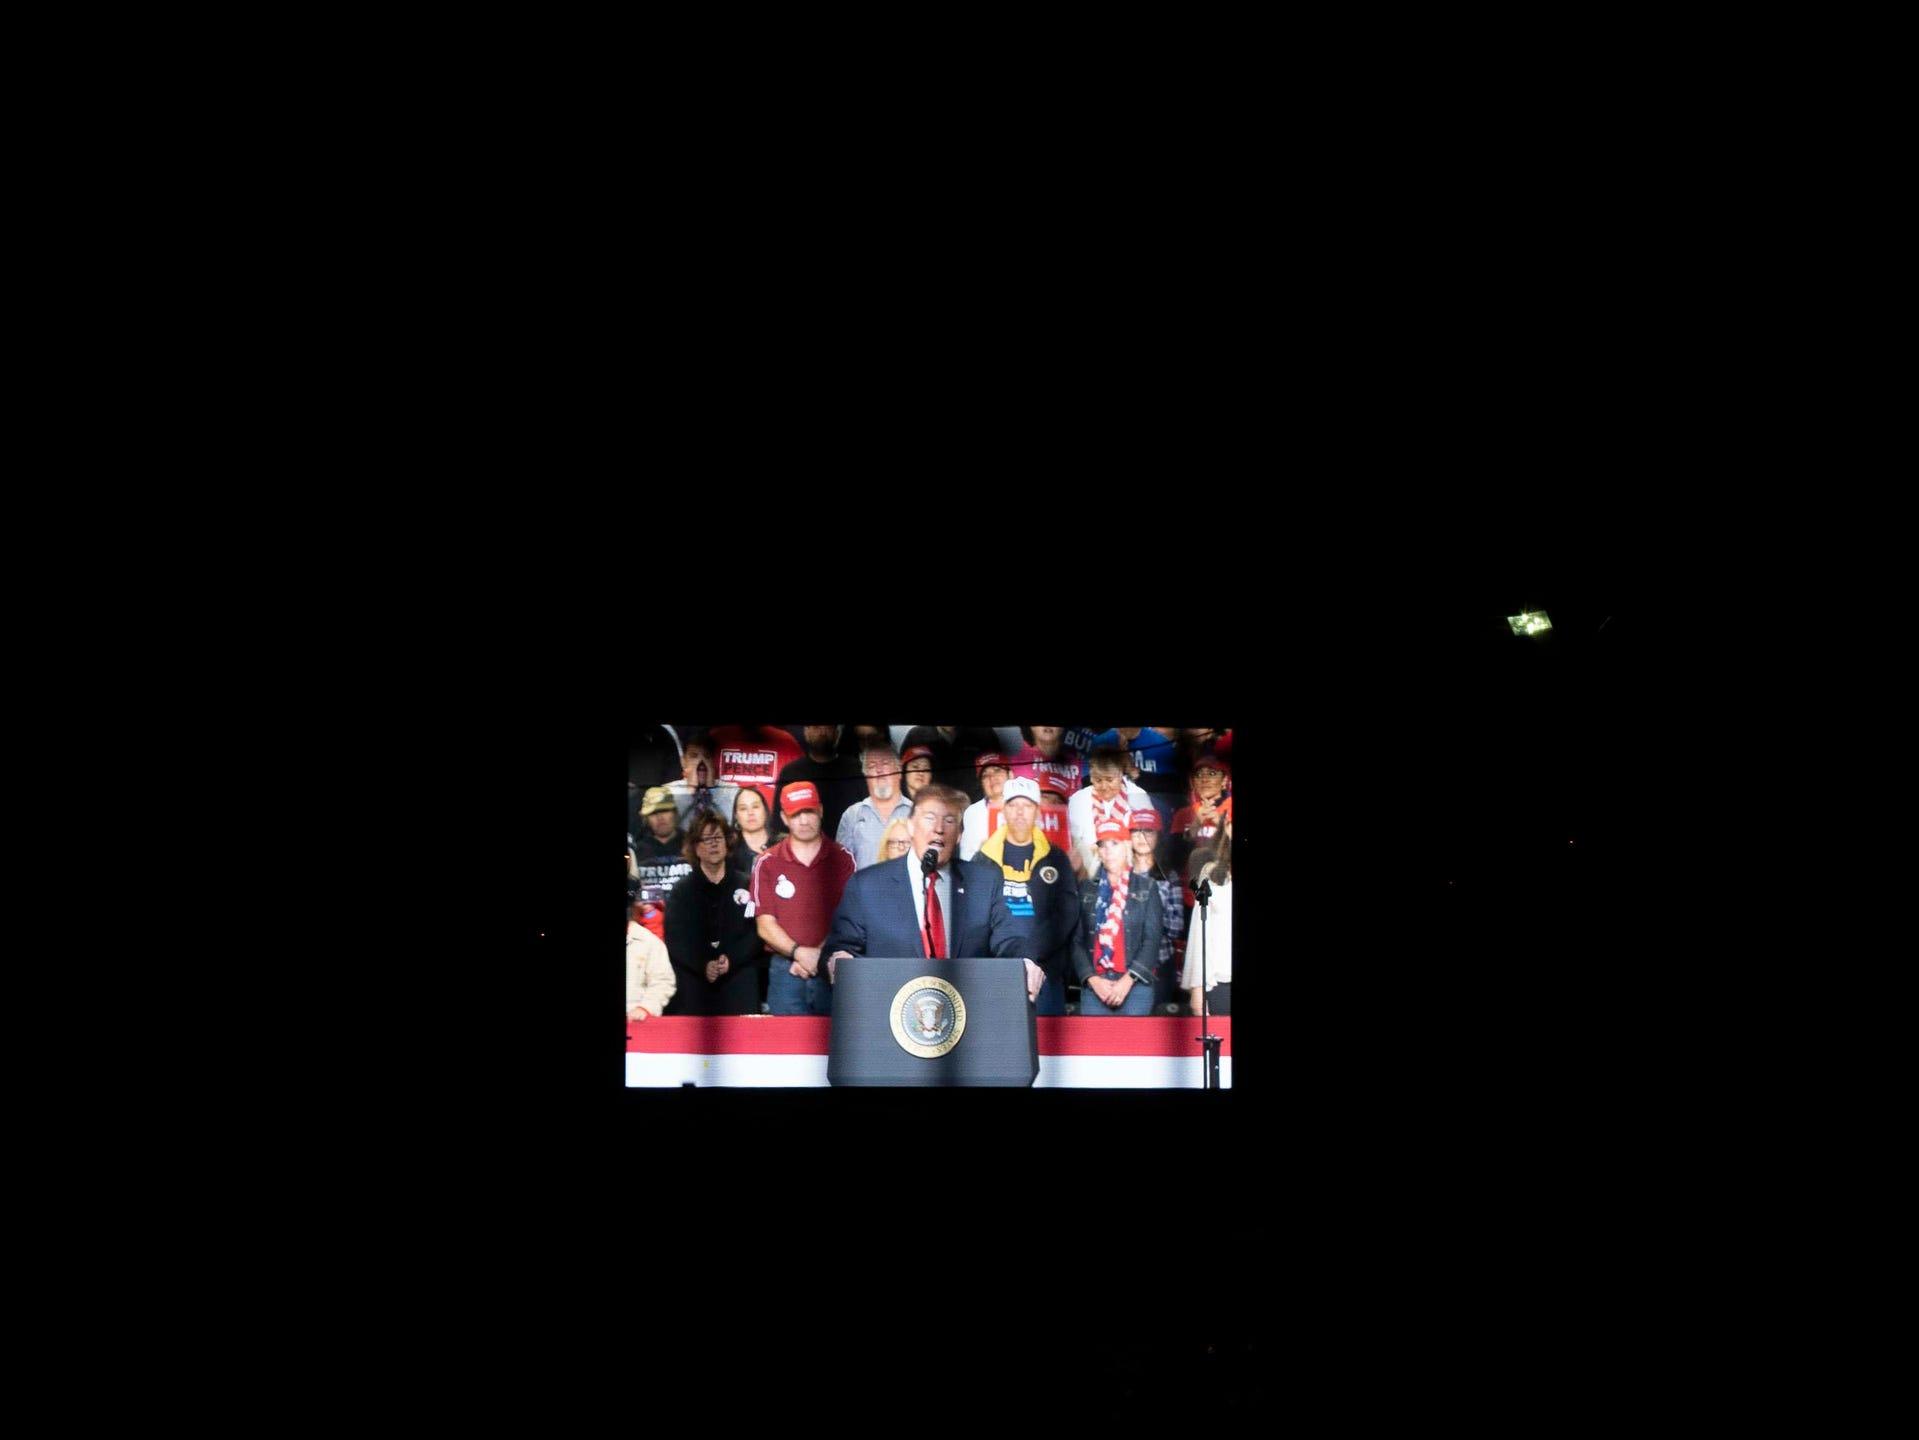 2/11/19 8:18:14 PM -- El Paso, TX, U.S.A  -- President Trump campaign rally near El Paso County Coliseum on Feb. 11, 2019.